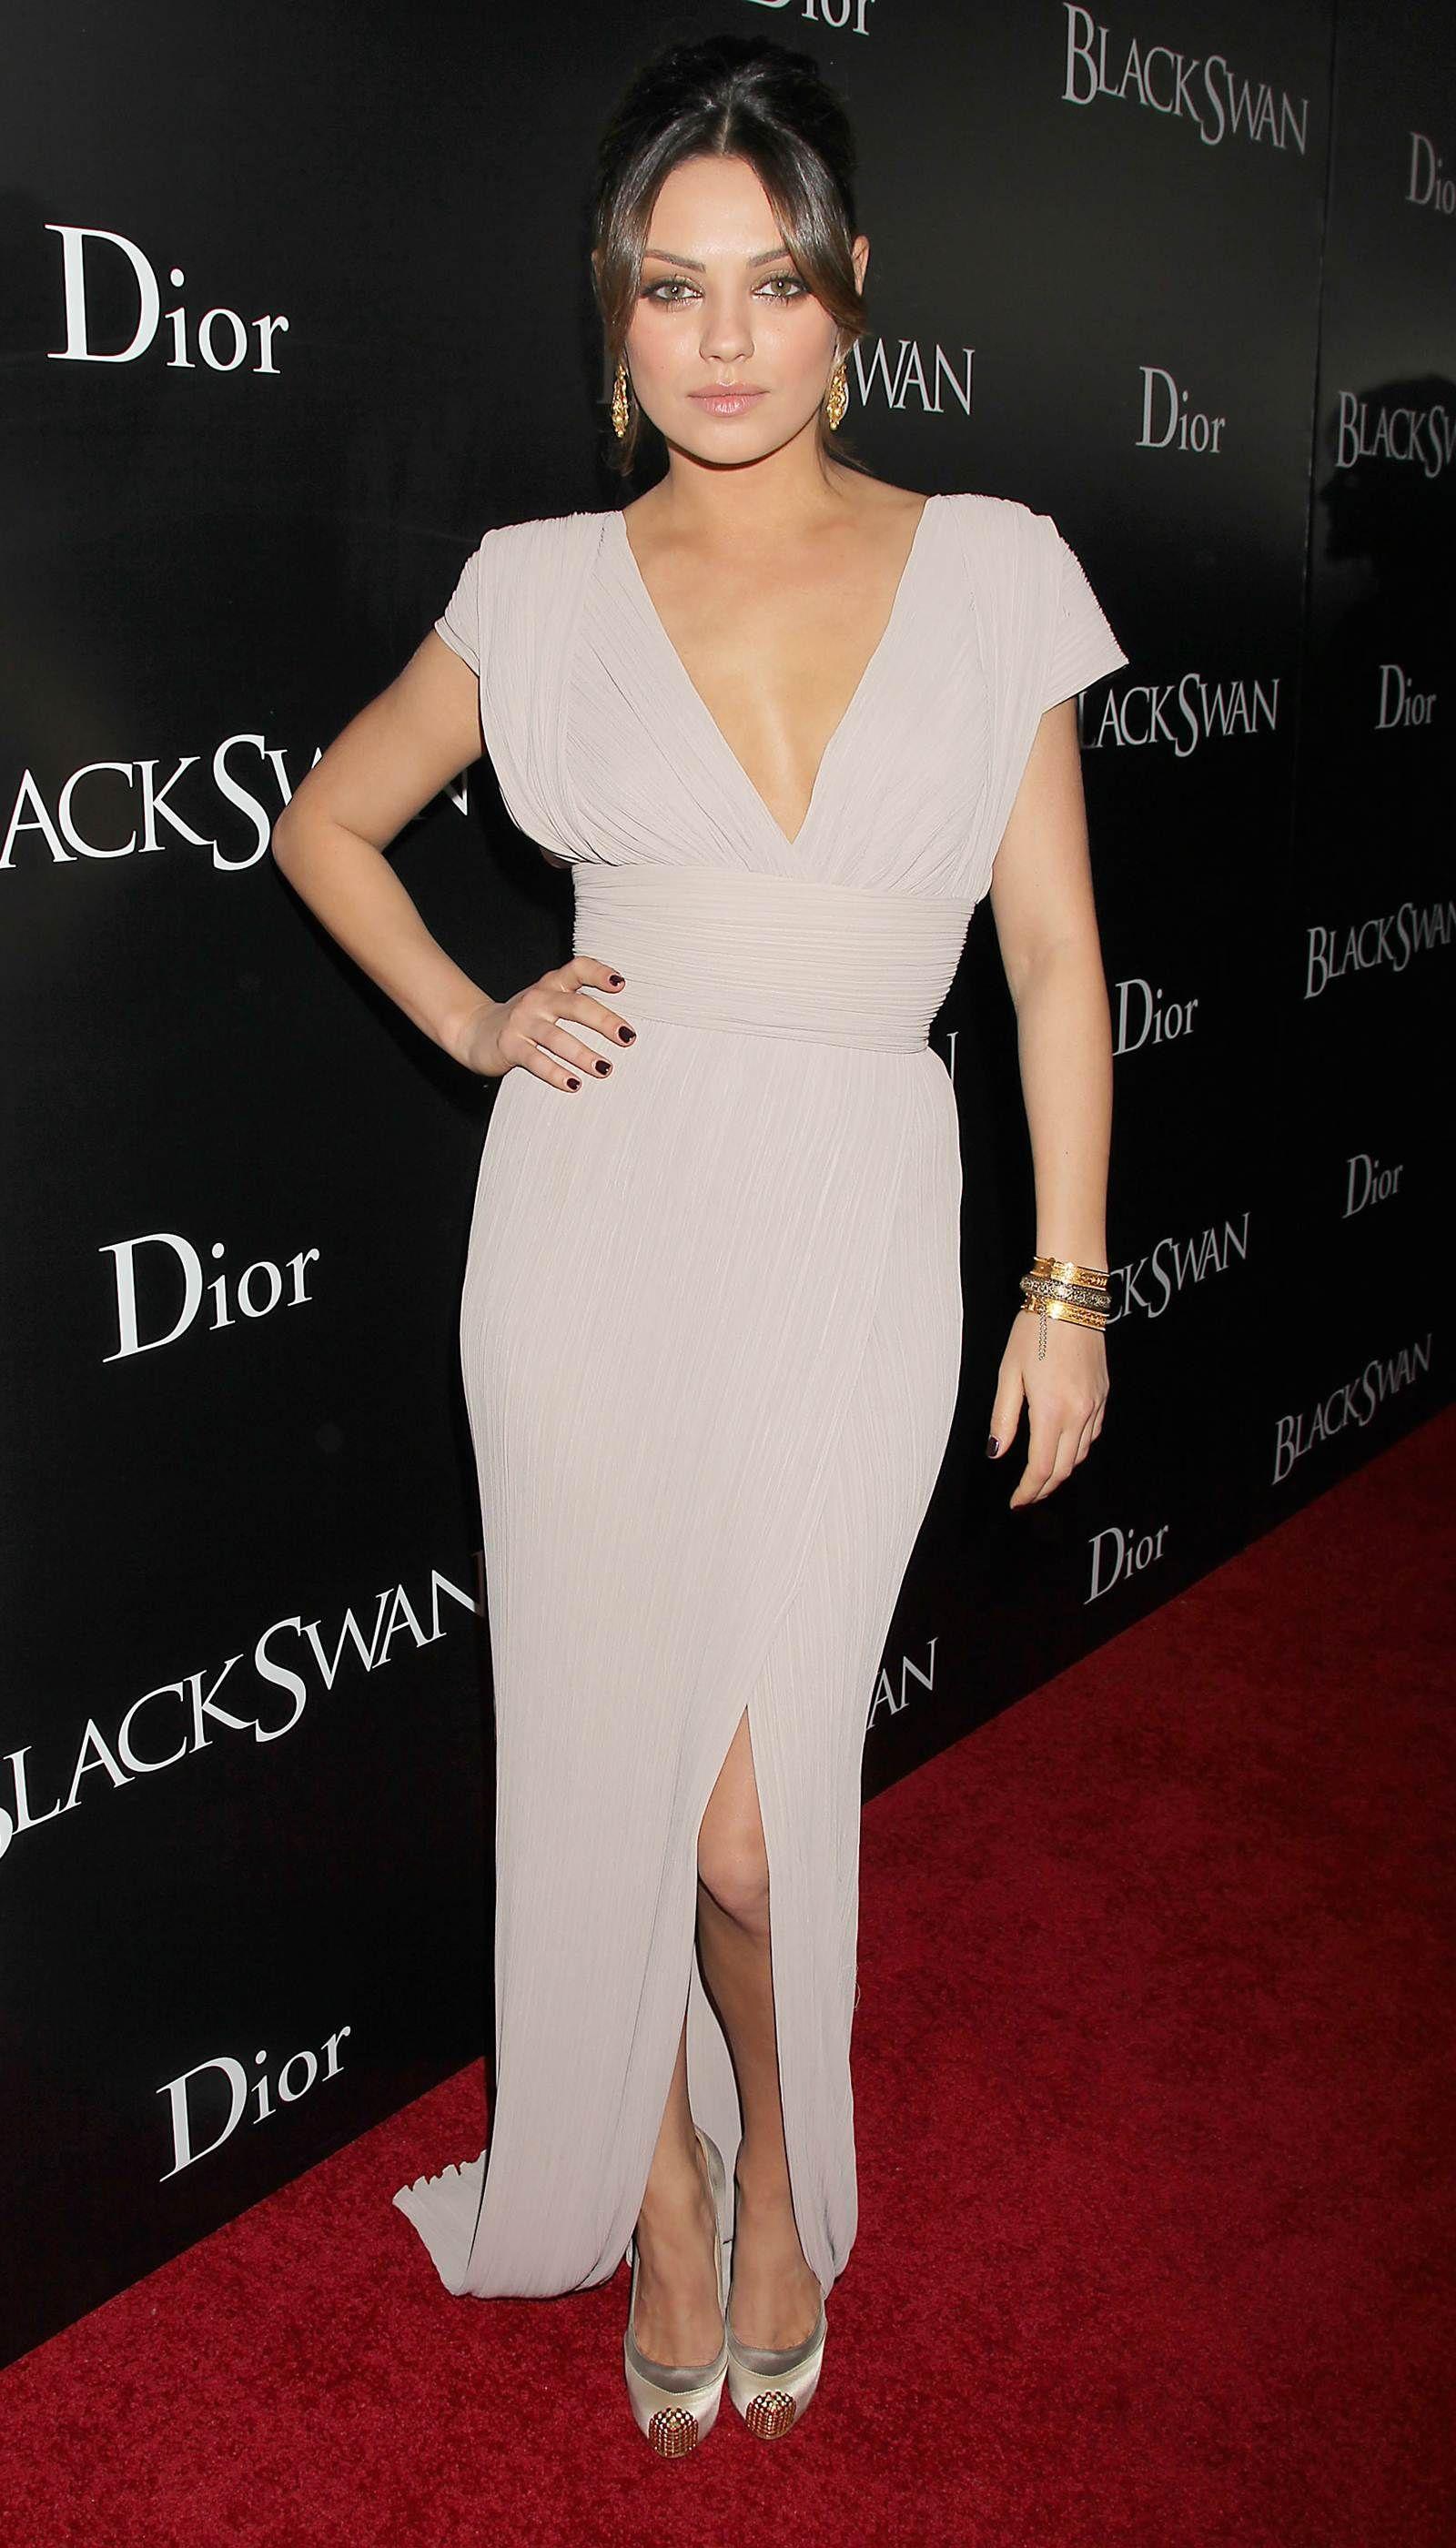 Mila Kunis. Black Swan premiere Robes de tapis rouges  Red carpet dresses